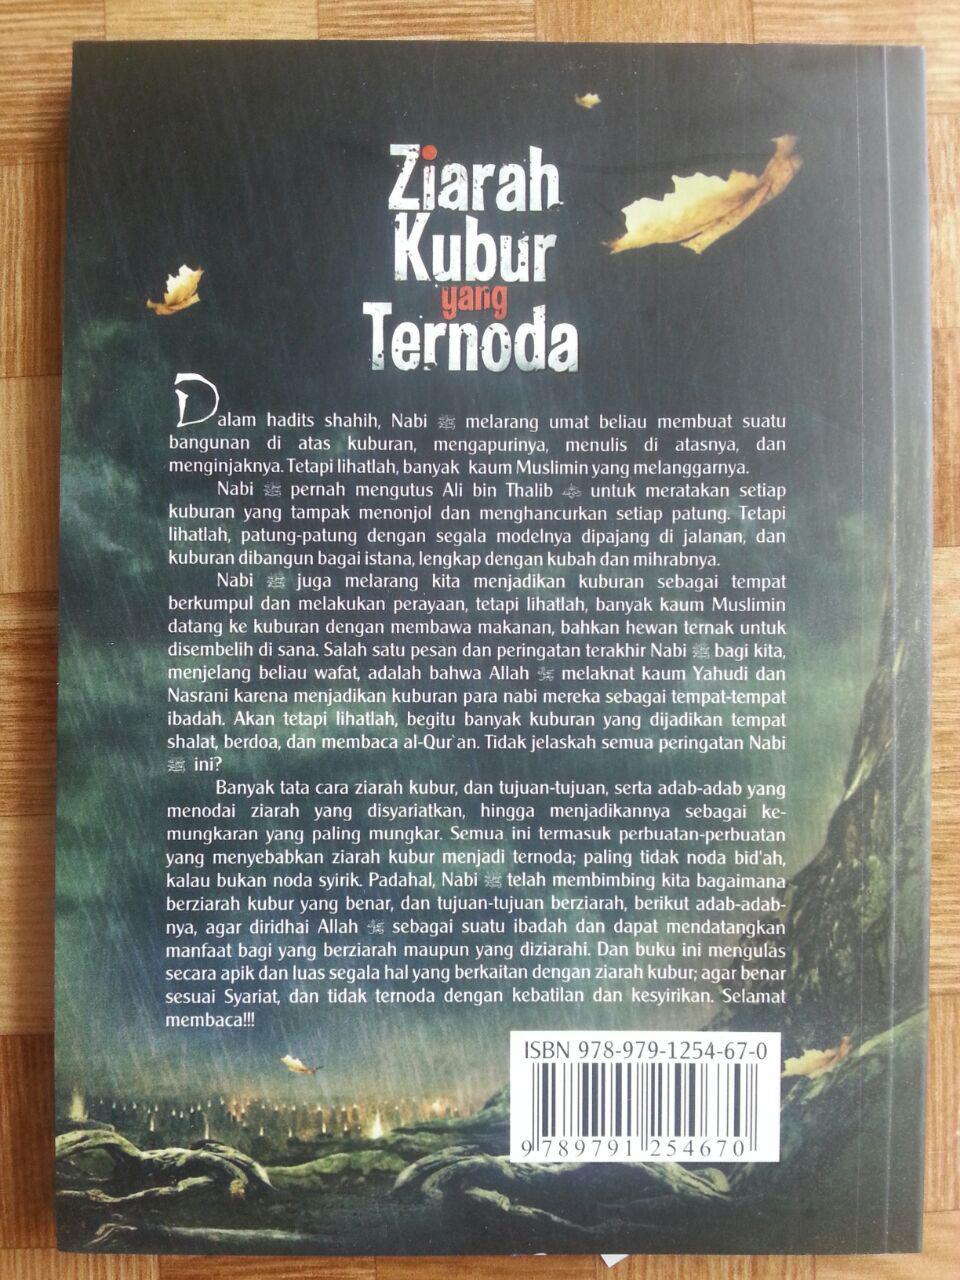 Buku Ziarah Kubur Yang Ternoda cover